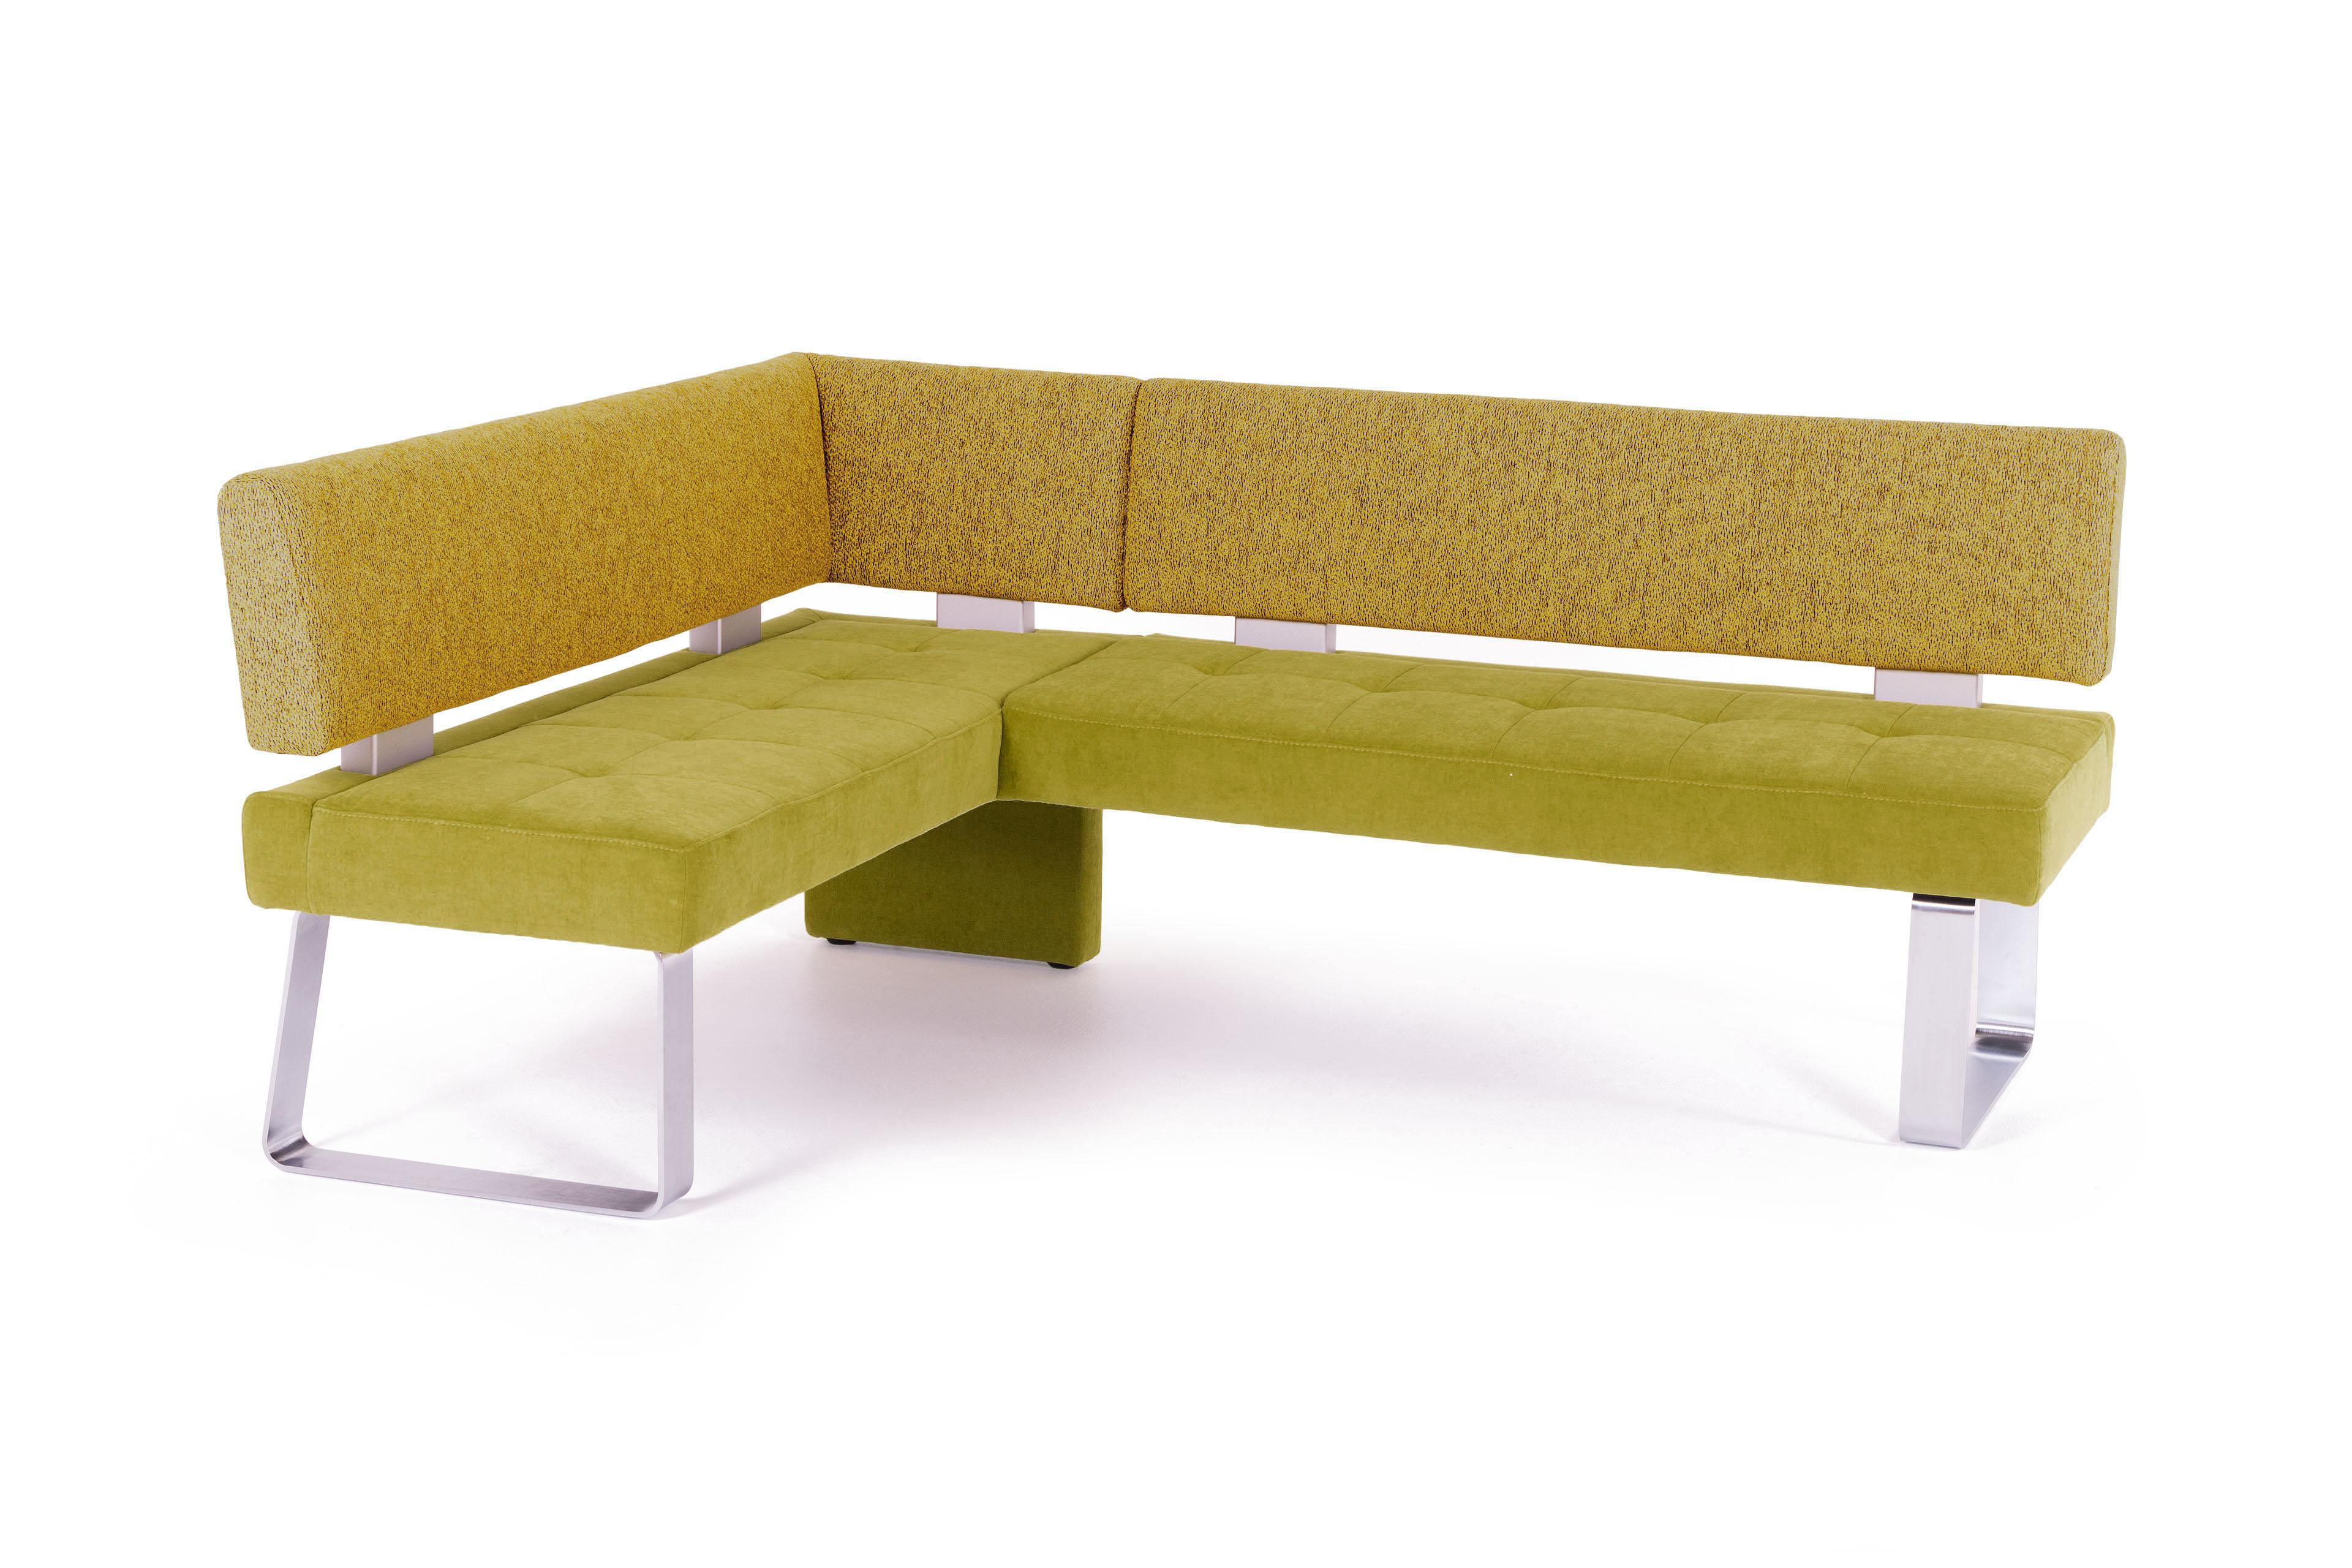 eckbank game i von k w polsterm bel m bel letz ihr. Black Bedroom Furniture Sets. Home Design Ideas